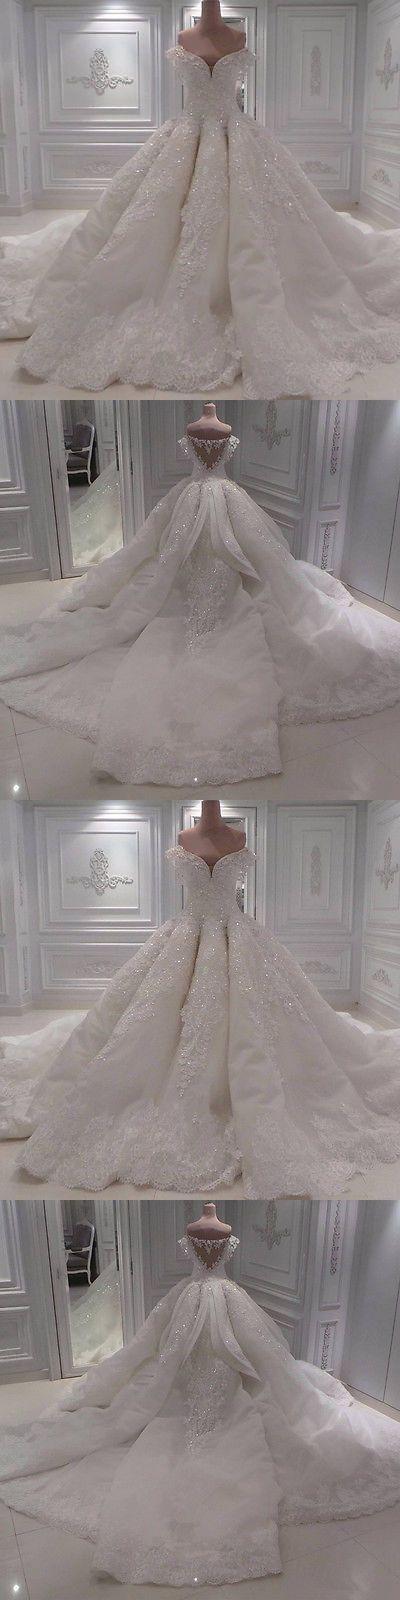 Wedding Dresses: New Luxury White Ivory Wedding Dress Bridal Gown Custom Plus Size2 4 6 8 10 12++ -> BUY IT NOW ONLY: $289.98 on eBay!